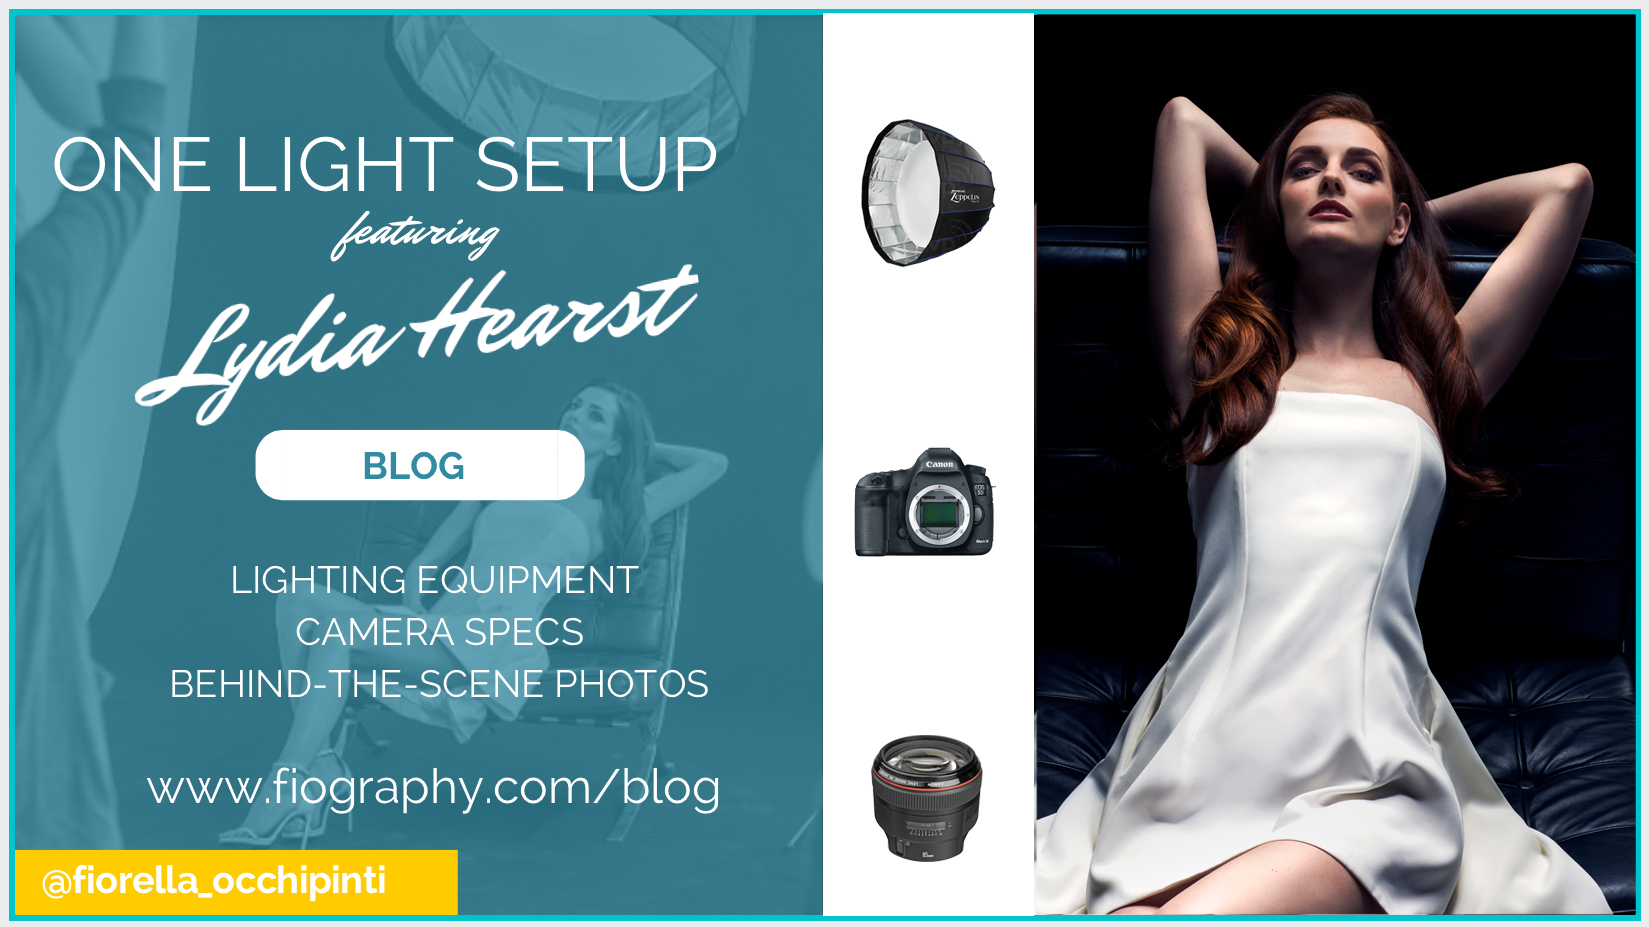 Follow @fiorella_occhipinti for blog updates